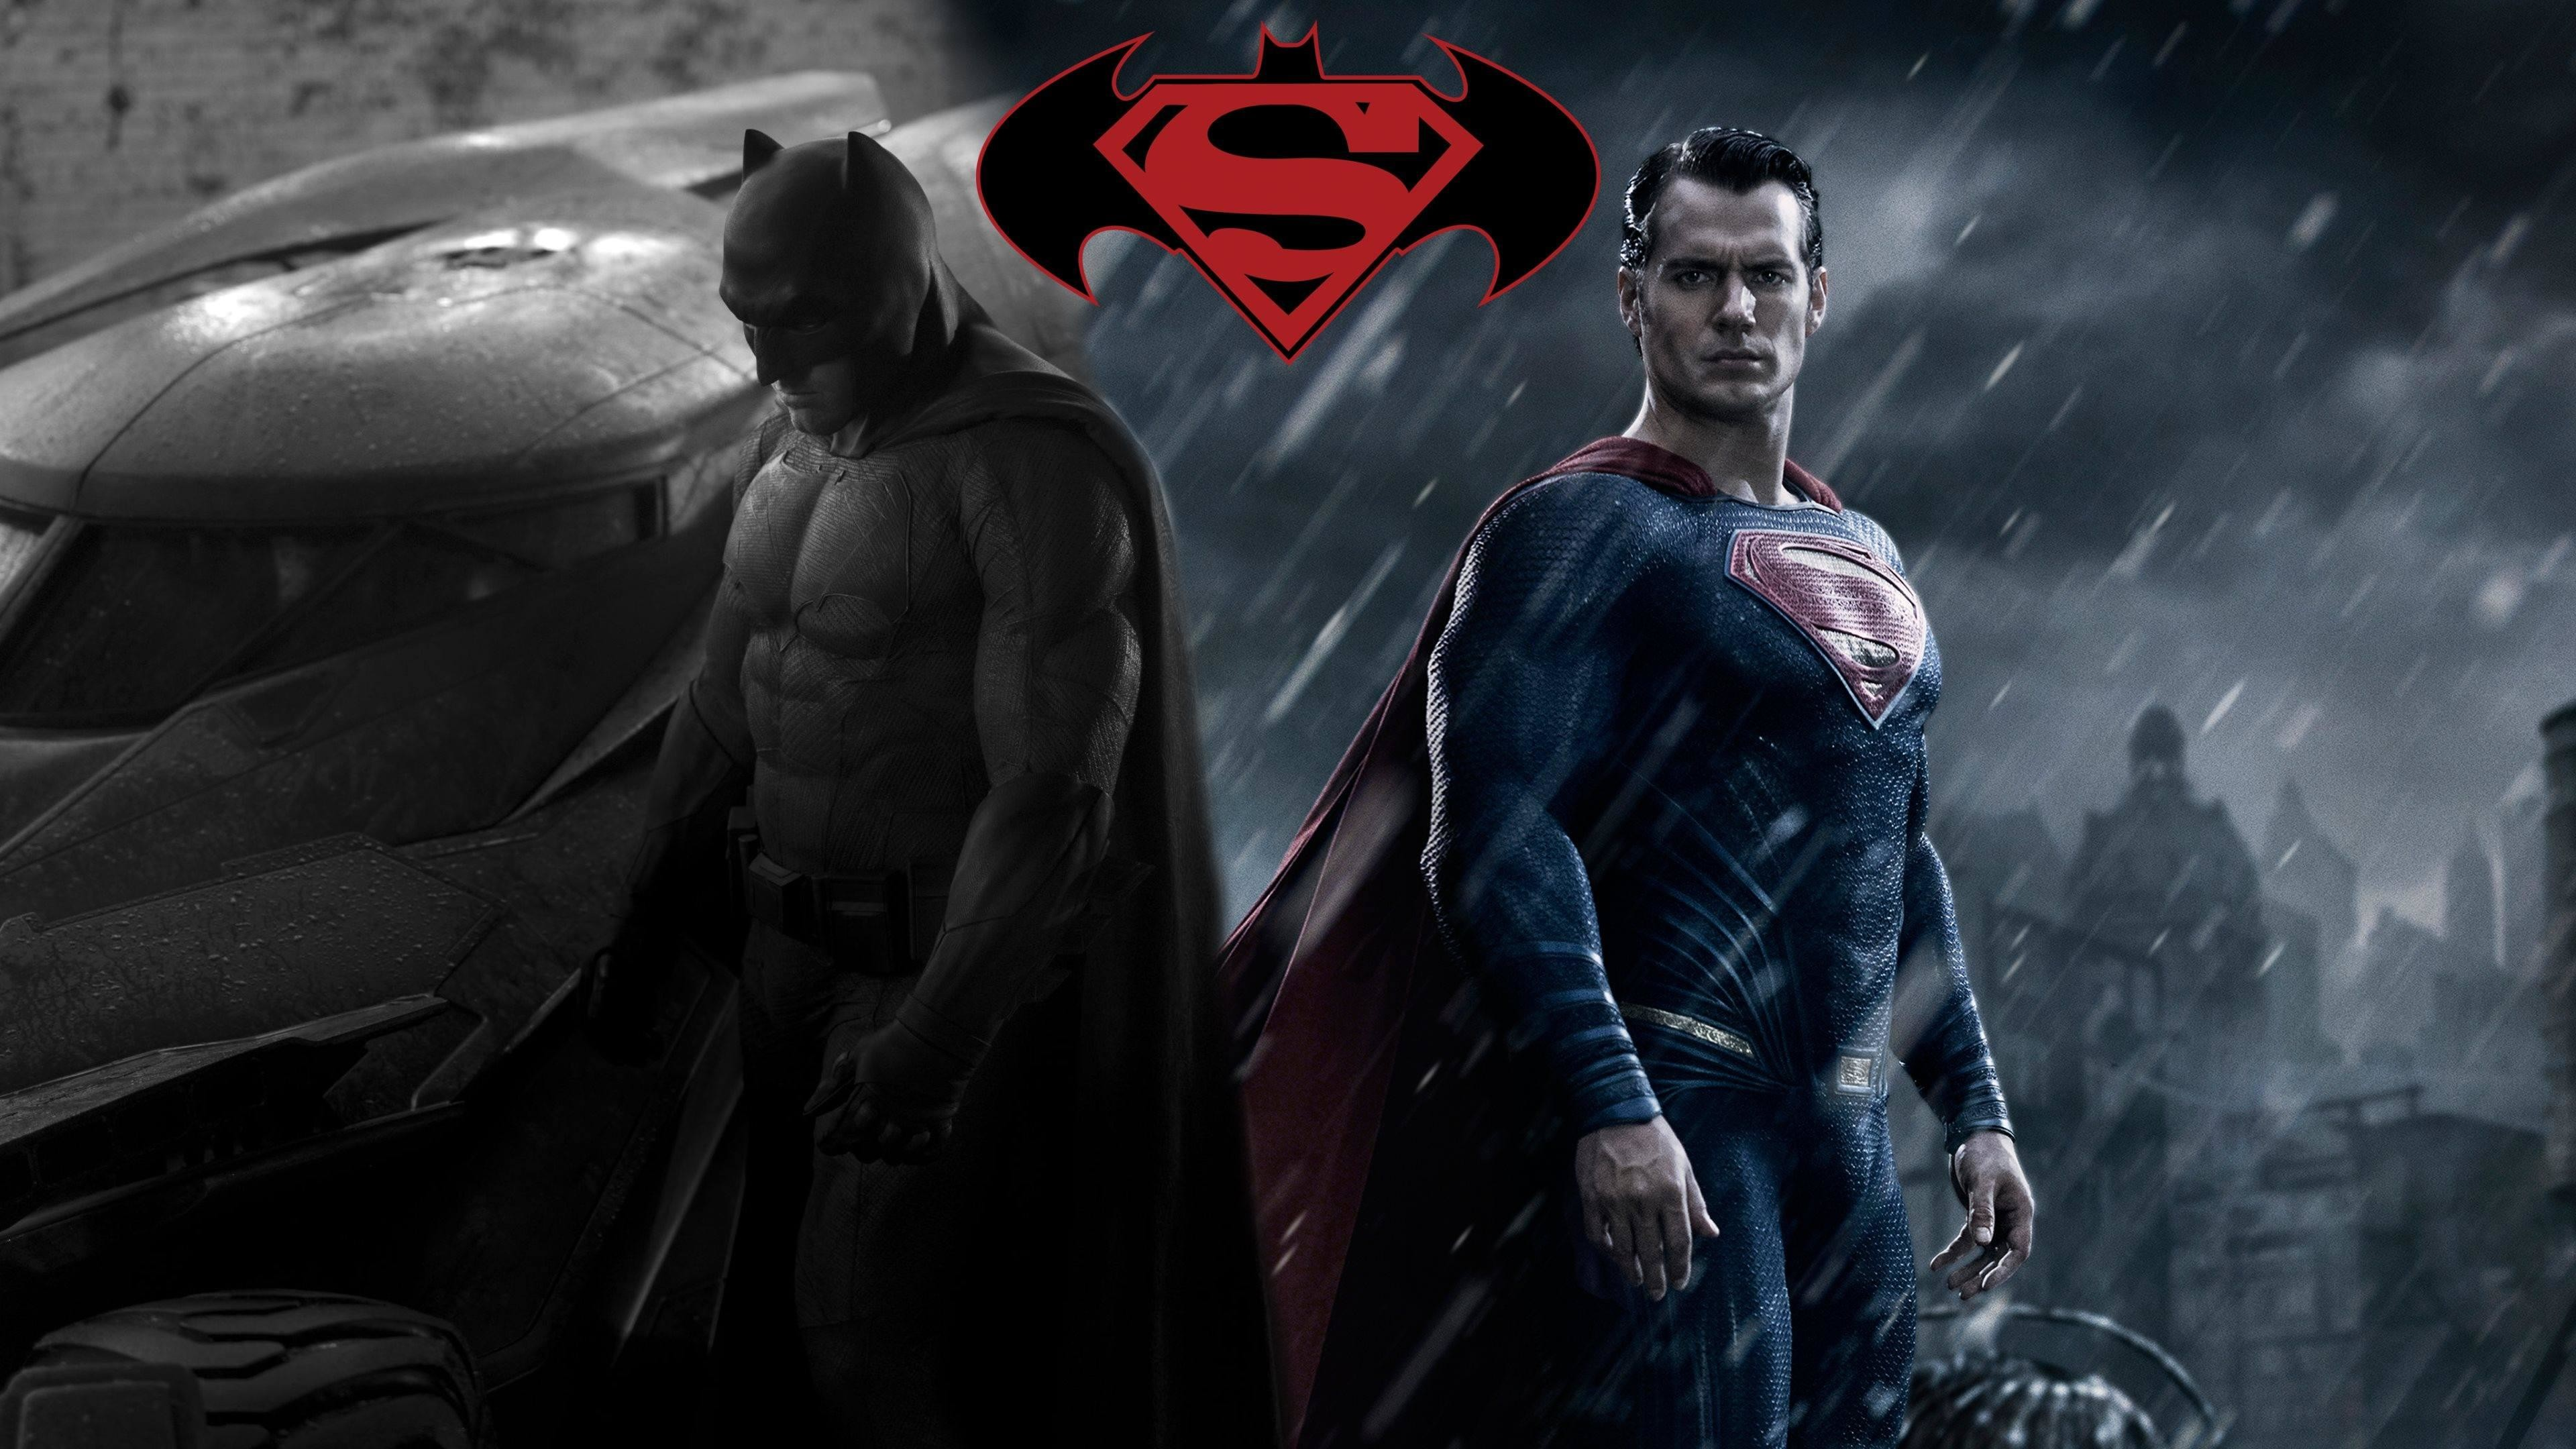 Batman Vs Superman Art Ultra Hd 4k Wallpaper – HD Wallpapers .